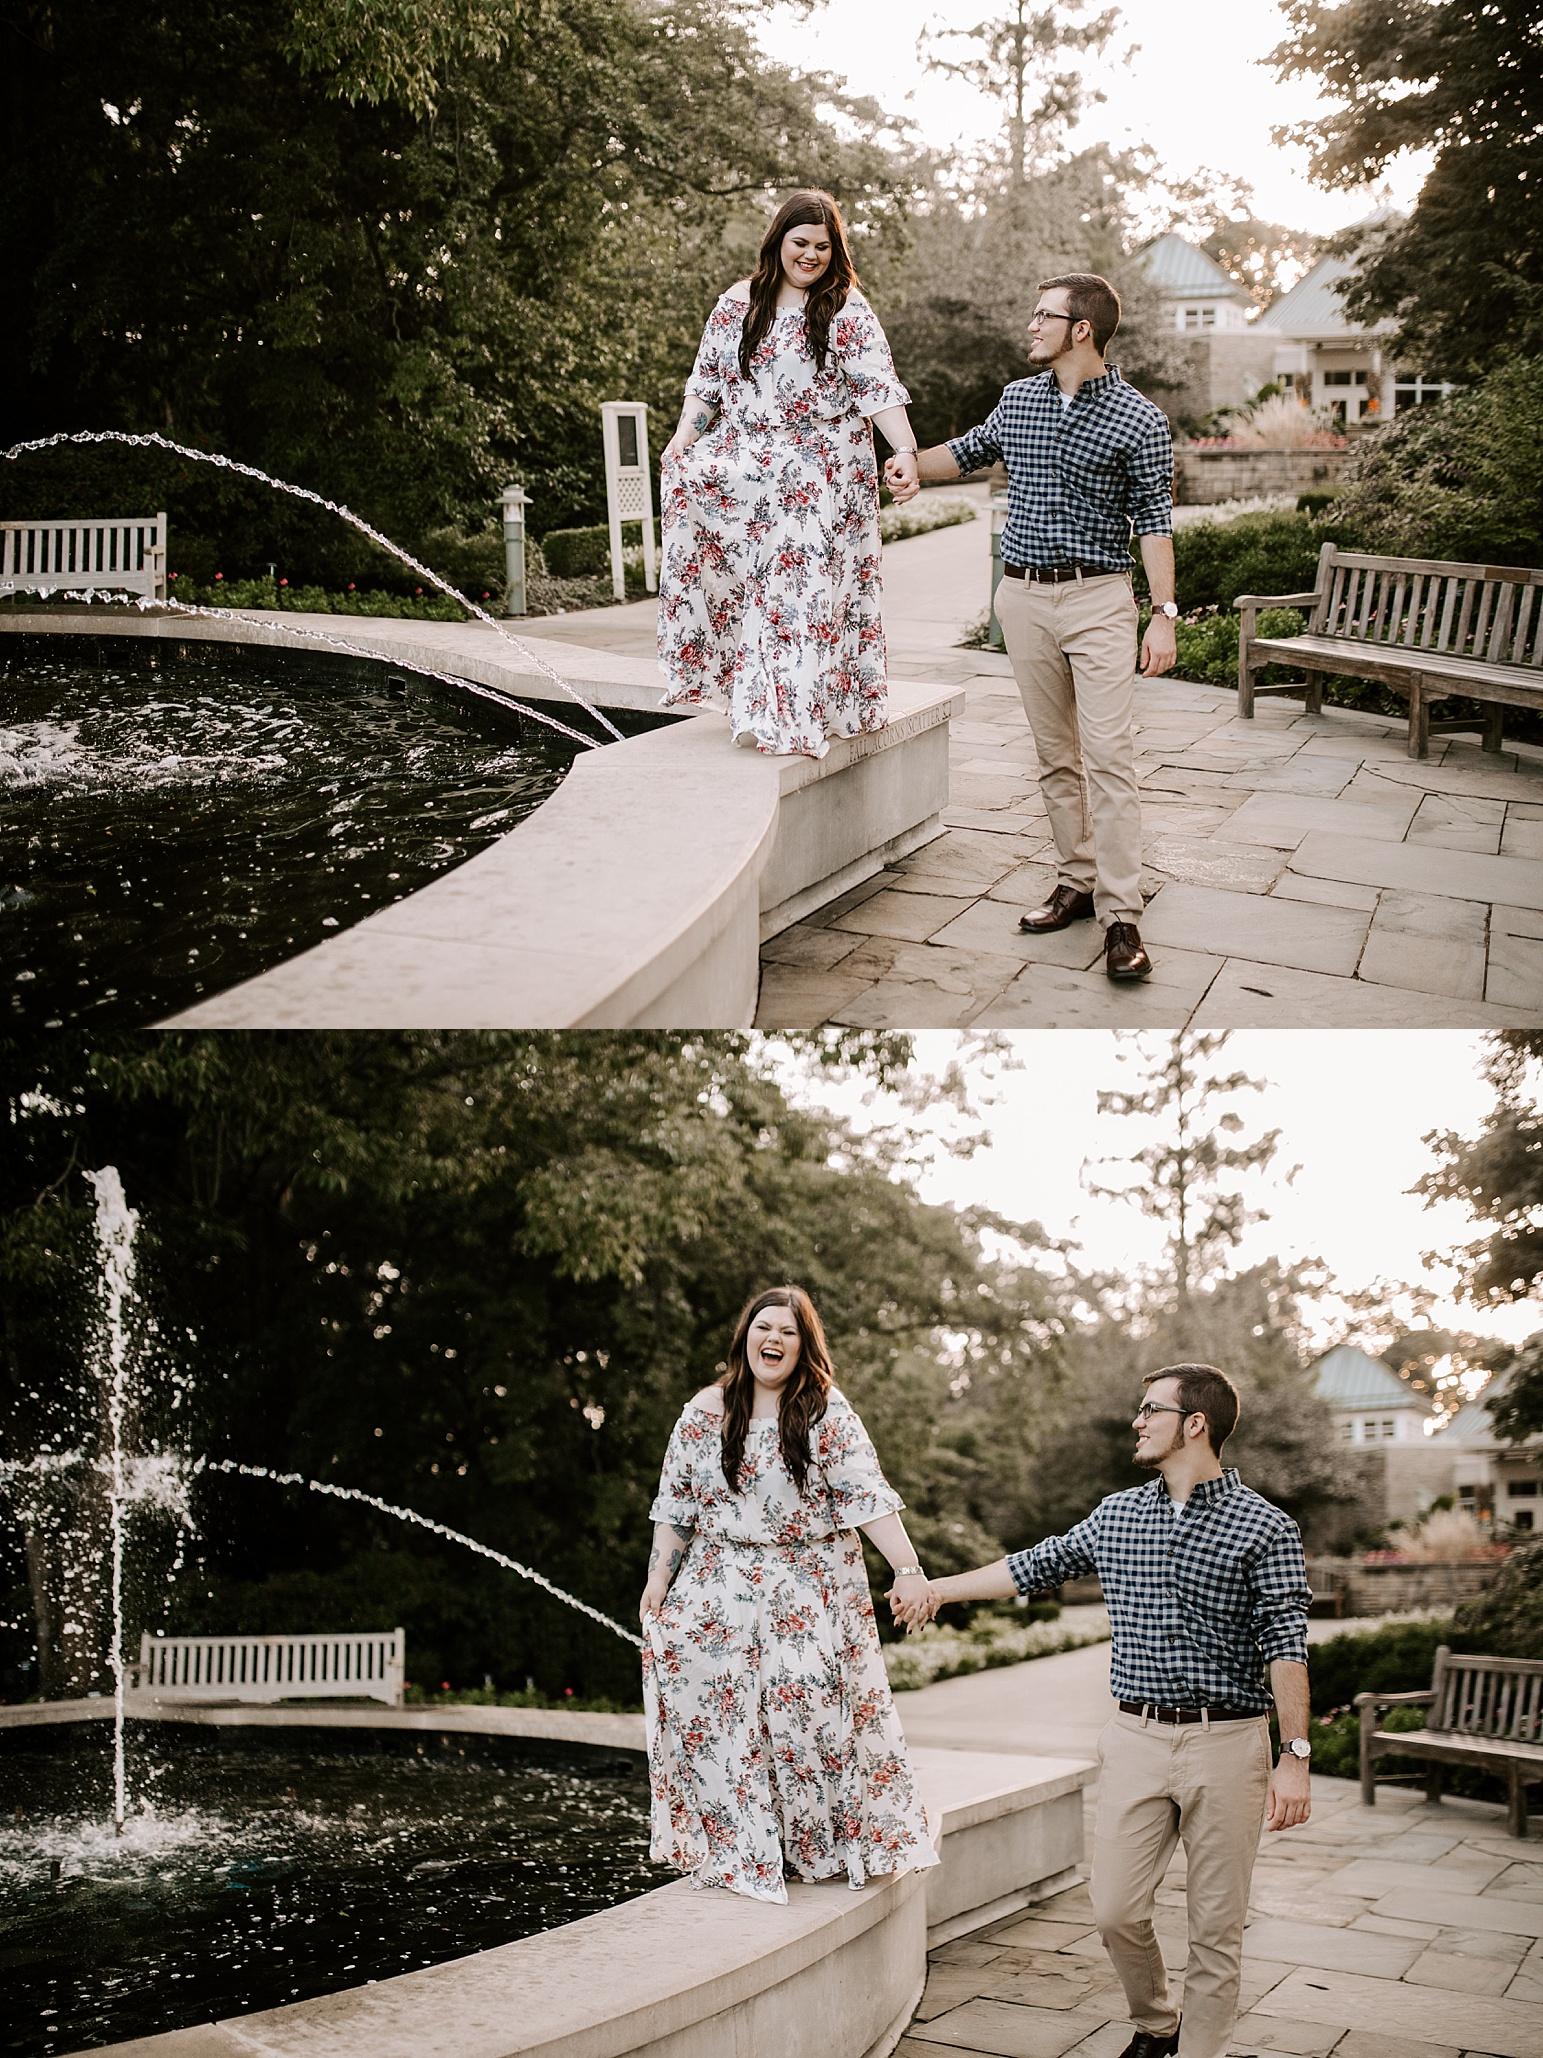 ashley_sara_photography_pittsburgh-wedding-photographer_ohio-wedding-photographer_destination-wedding-photographer1.jpg